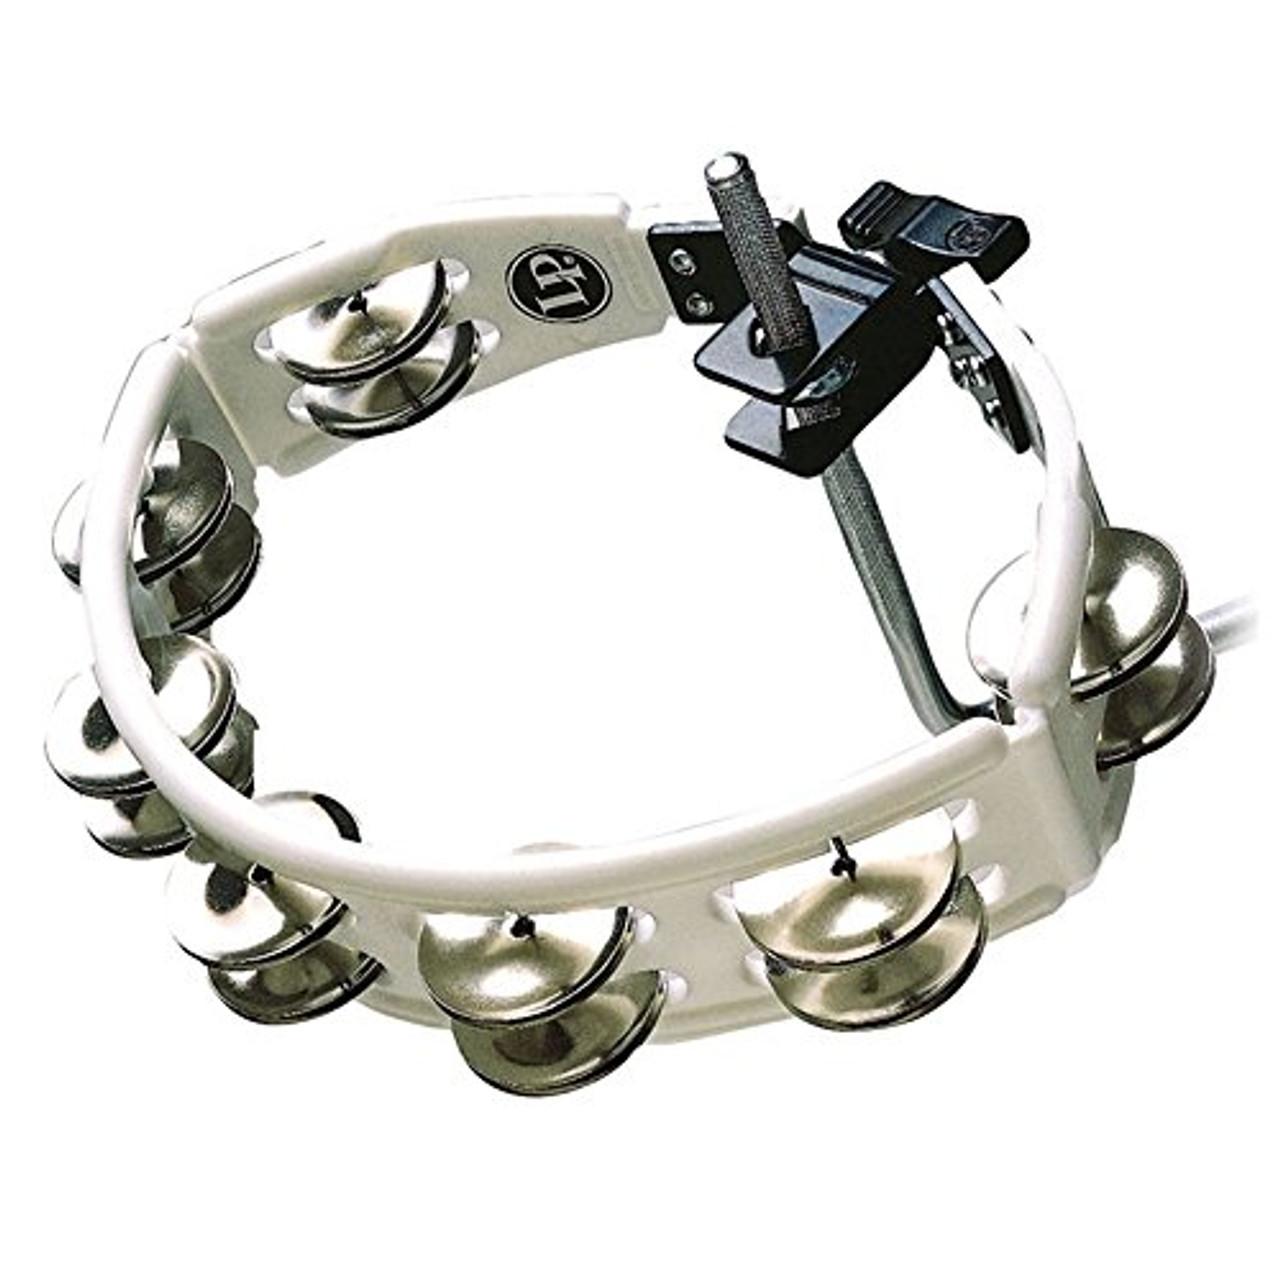 Drum Workshop Cyclops Mounted Tambourine White Steel